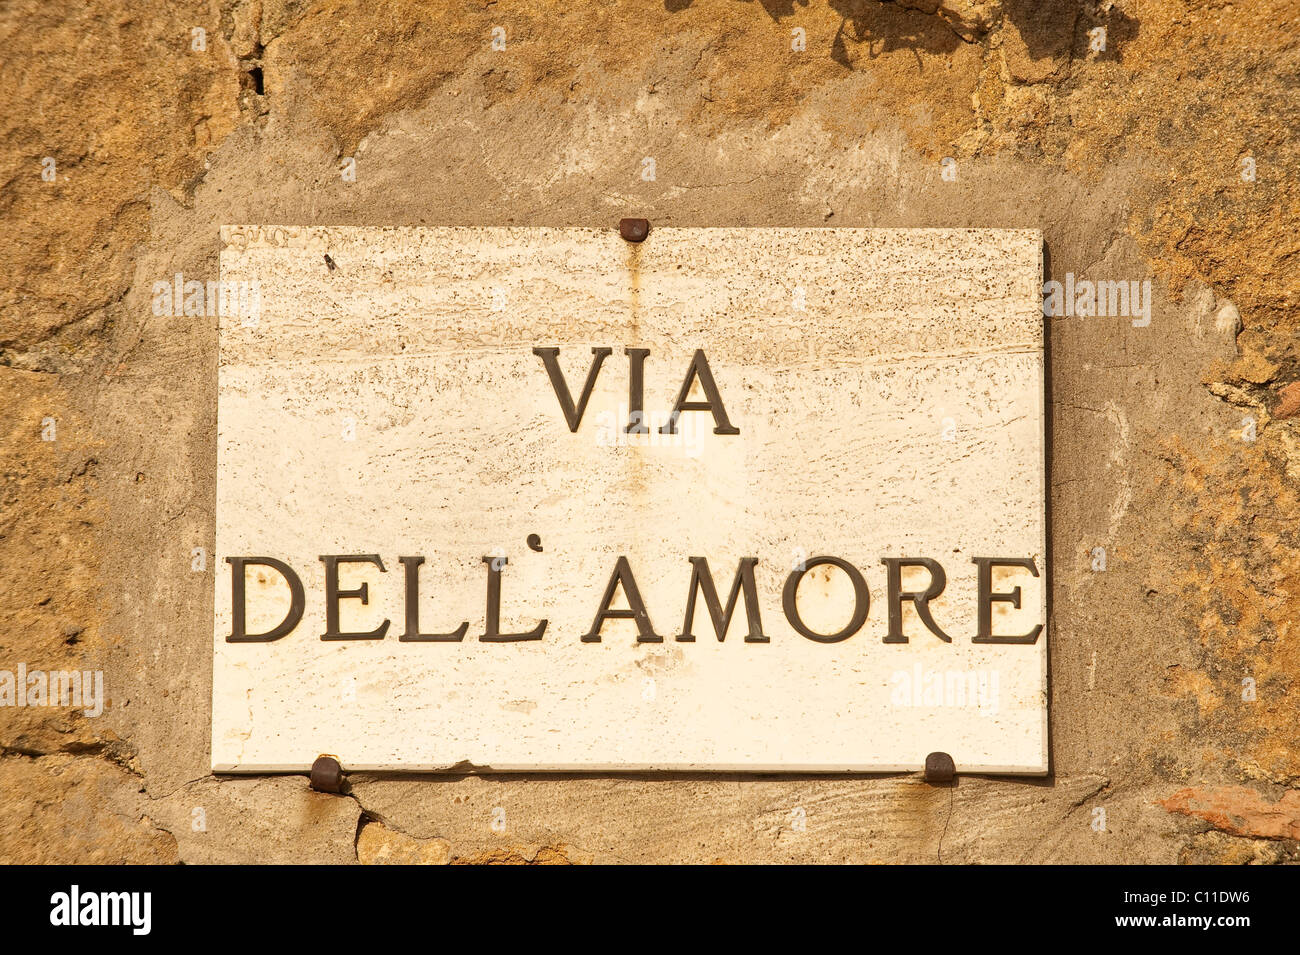 Street sign, Via delle Amore, Pienza, Tuscany, Italy, Europe - Stock Image